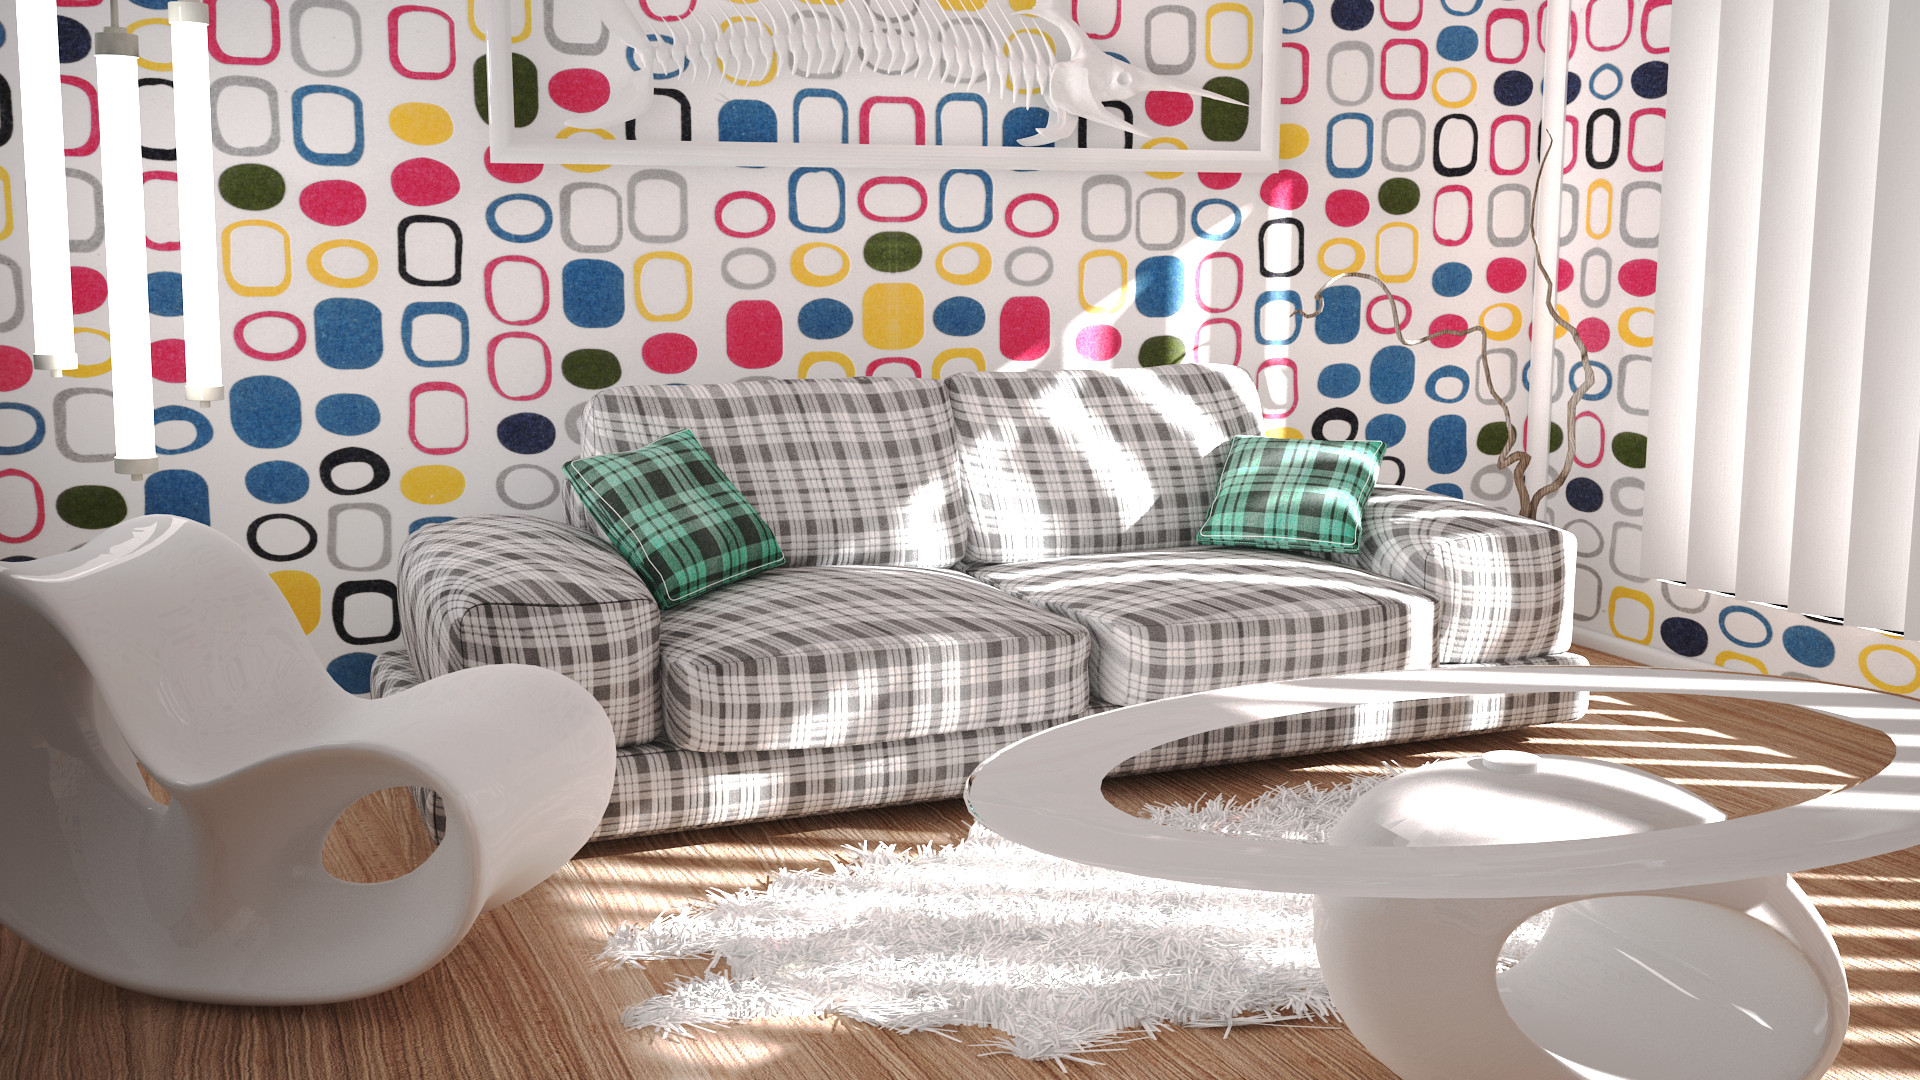 Cinema 4D -- White Room final version by SMOKEYoriginalHD